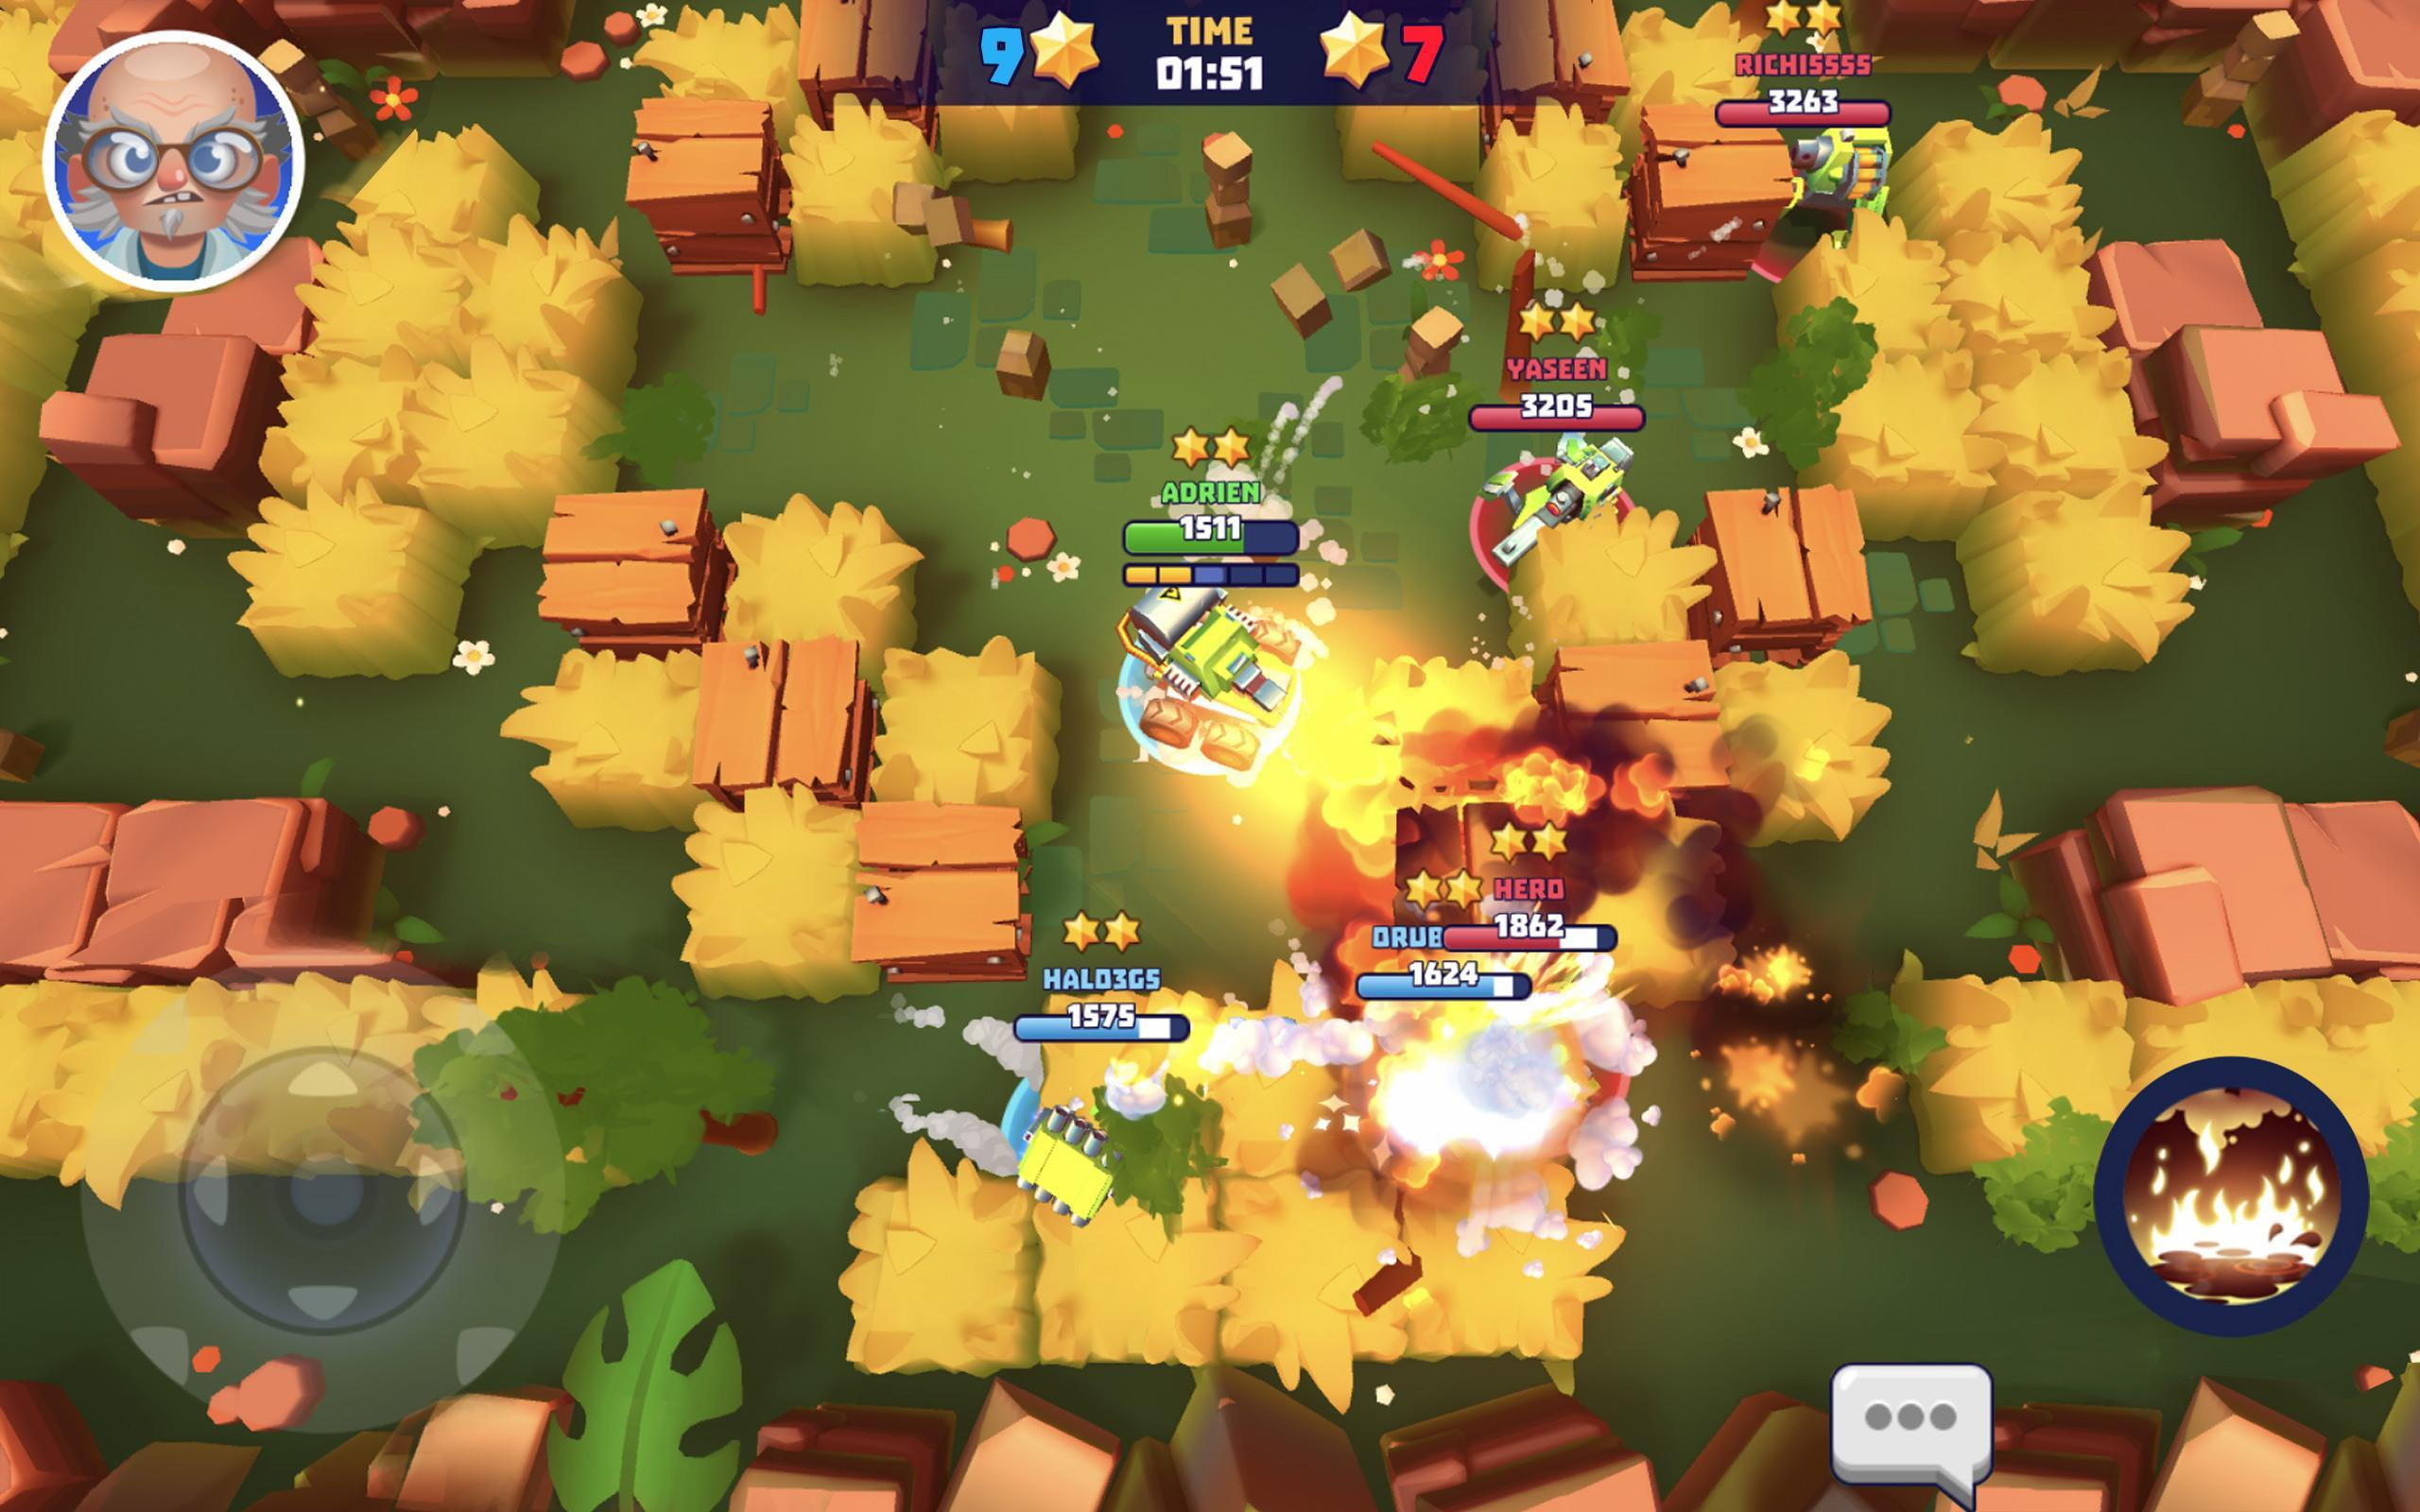 Tanks A Lot! - Realtime Multiplayer Battle Arena 2.56 Screenshot 16